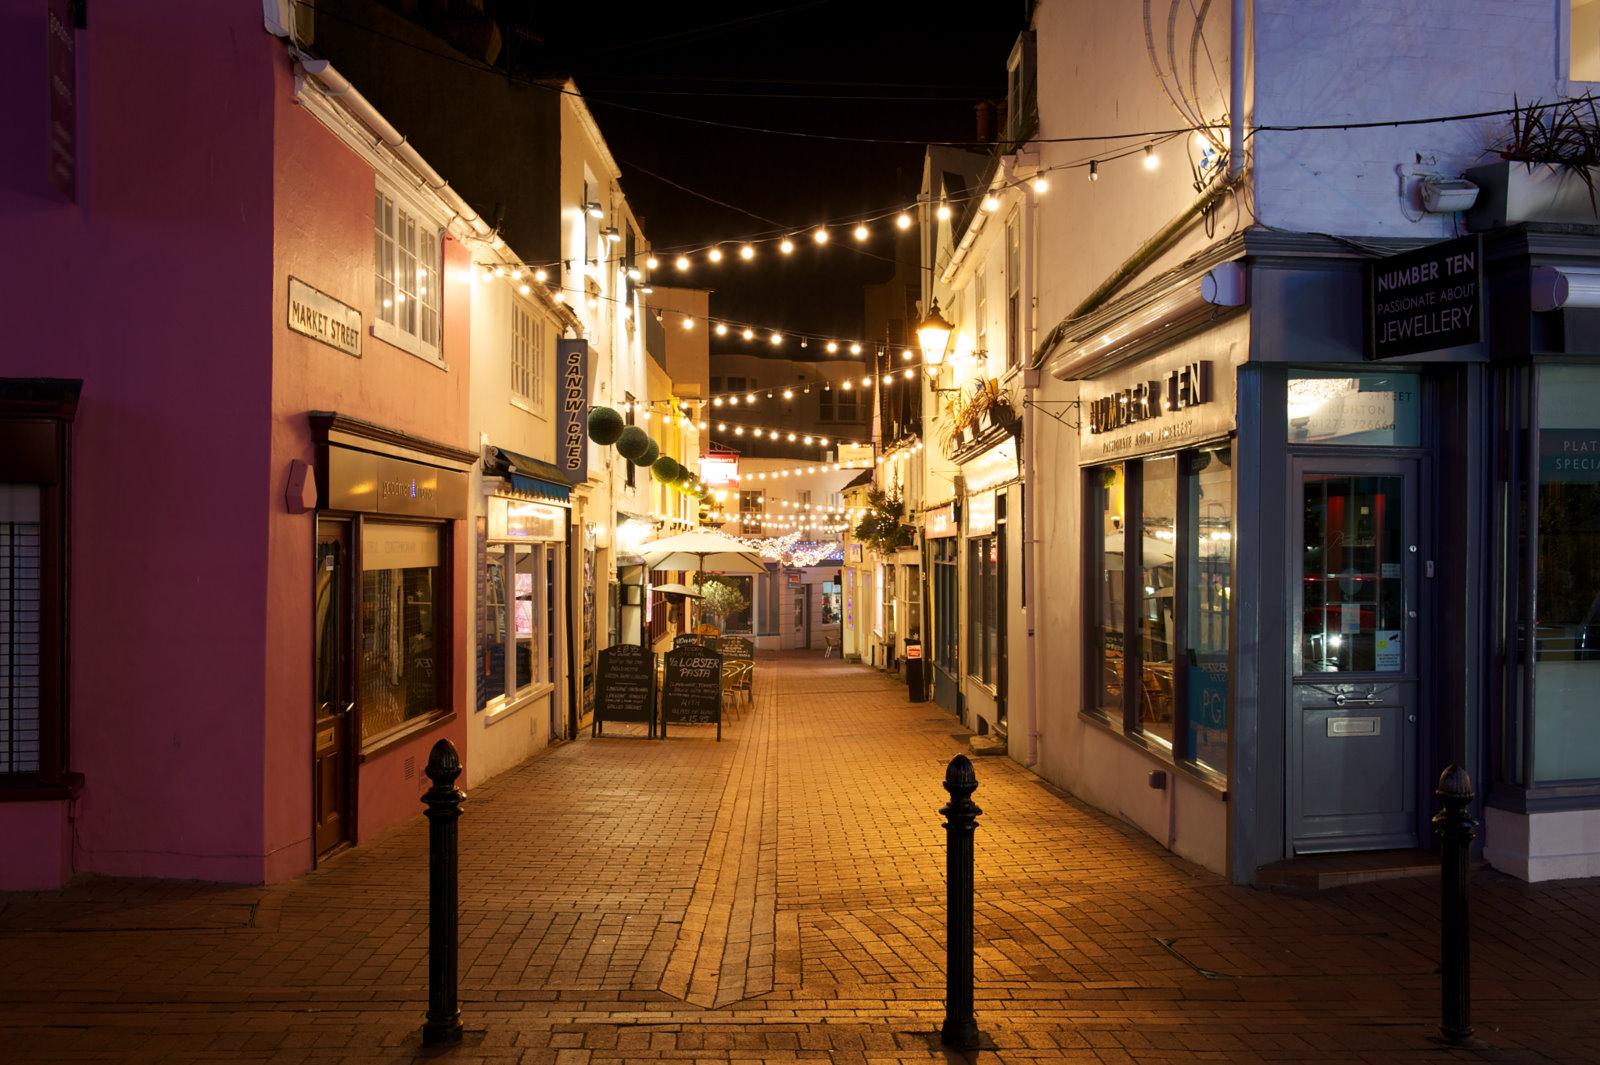 Brighton daily photo down in the lanes brighton nightime for The brighton